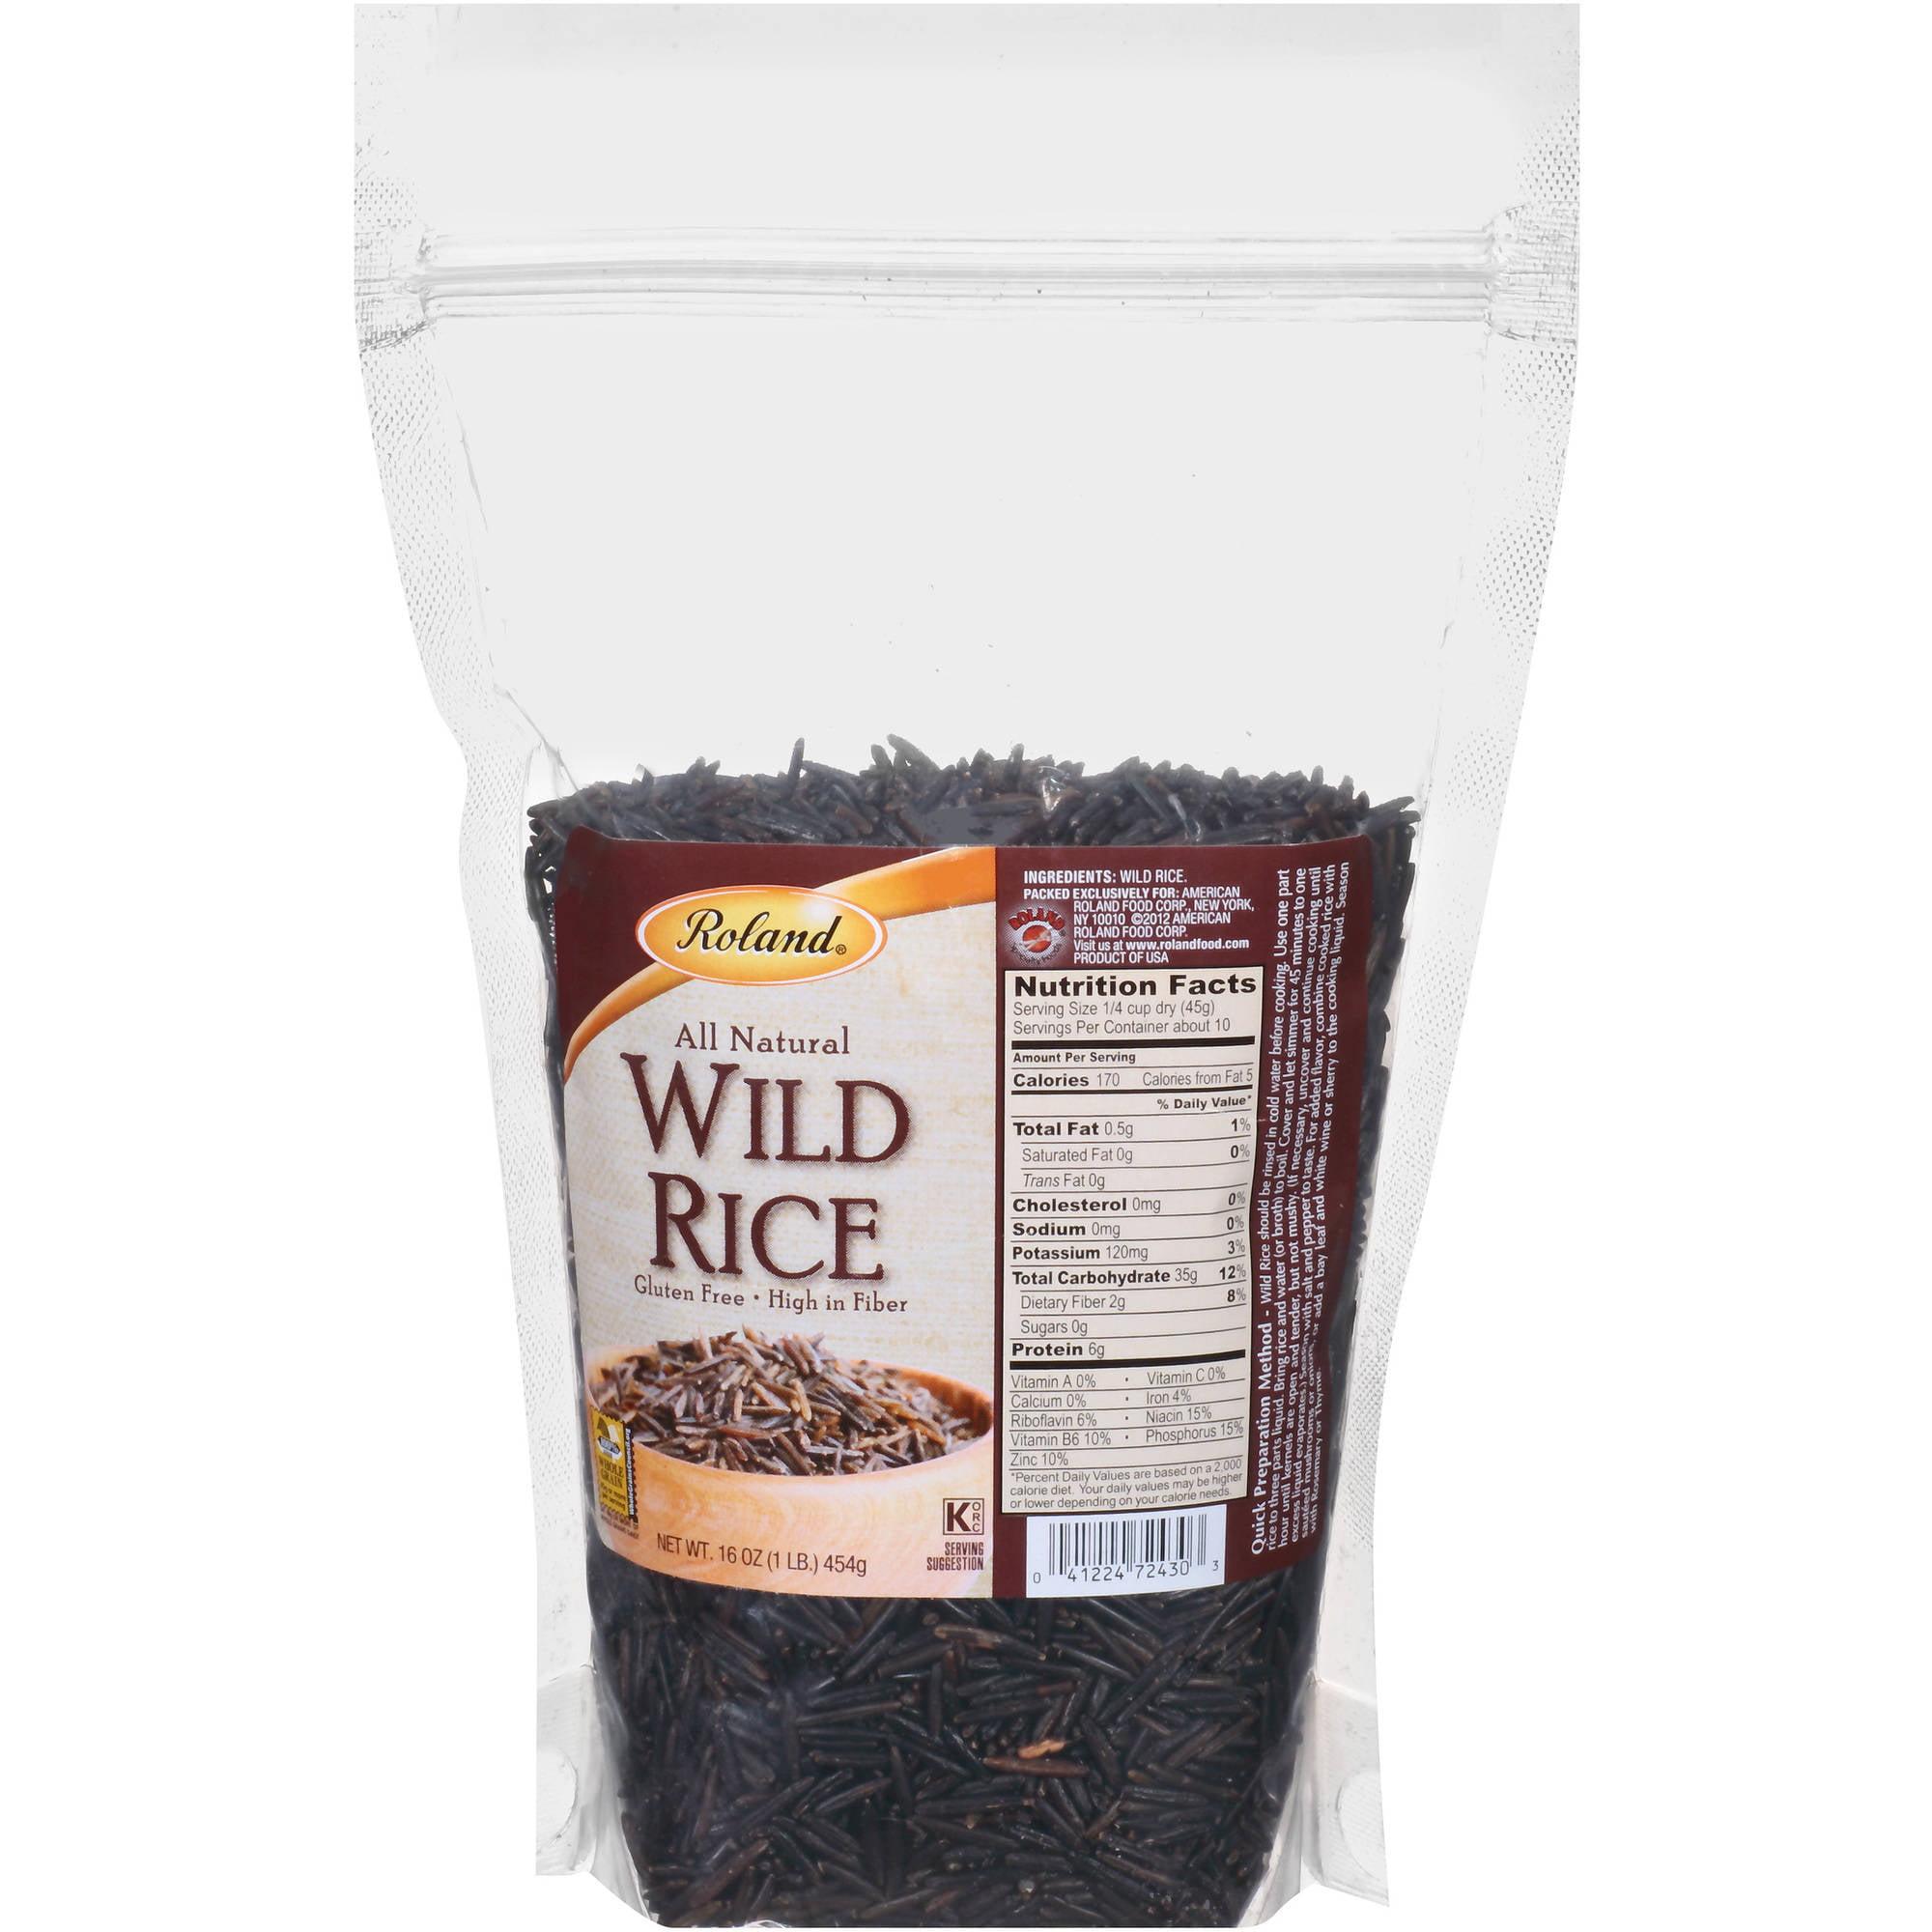 Roland All Natural Wild Rice, 16 oz